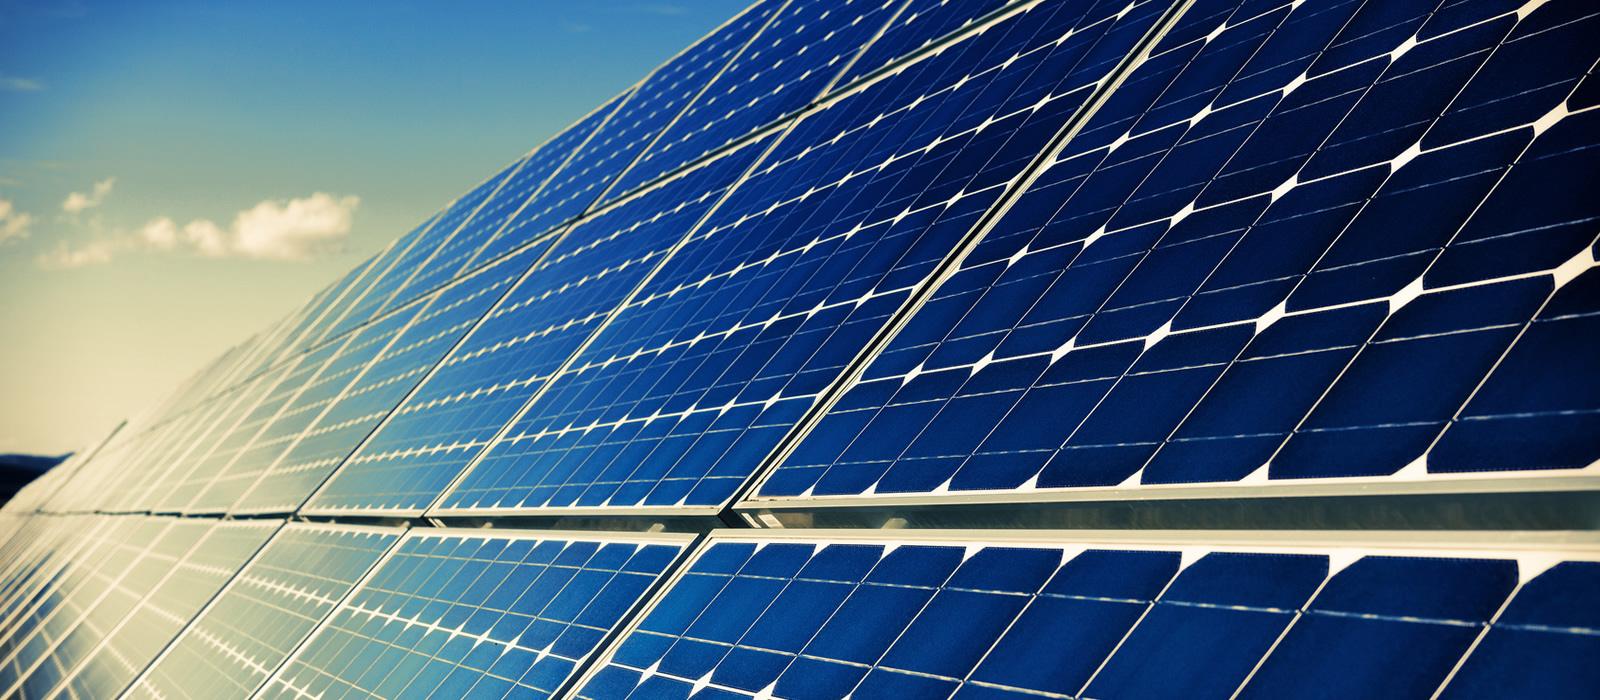 sonnendach invest photovoltaik solarstrom. Black Bedroom Furniture Sets. Home Design Ideas